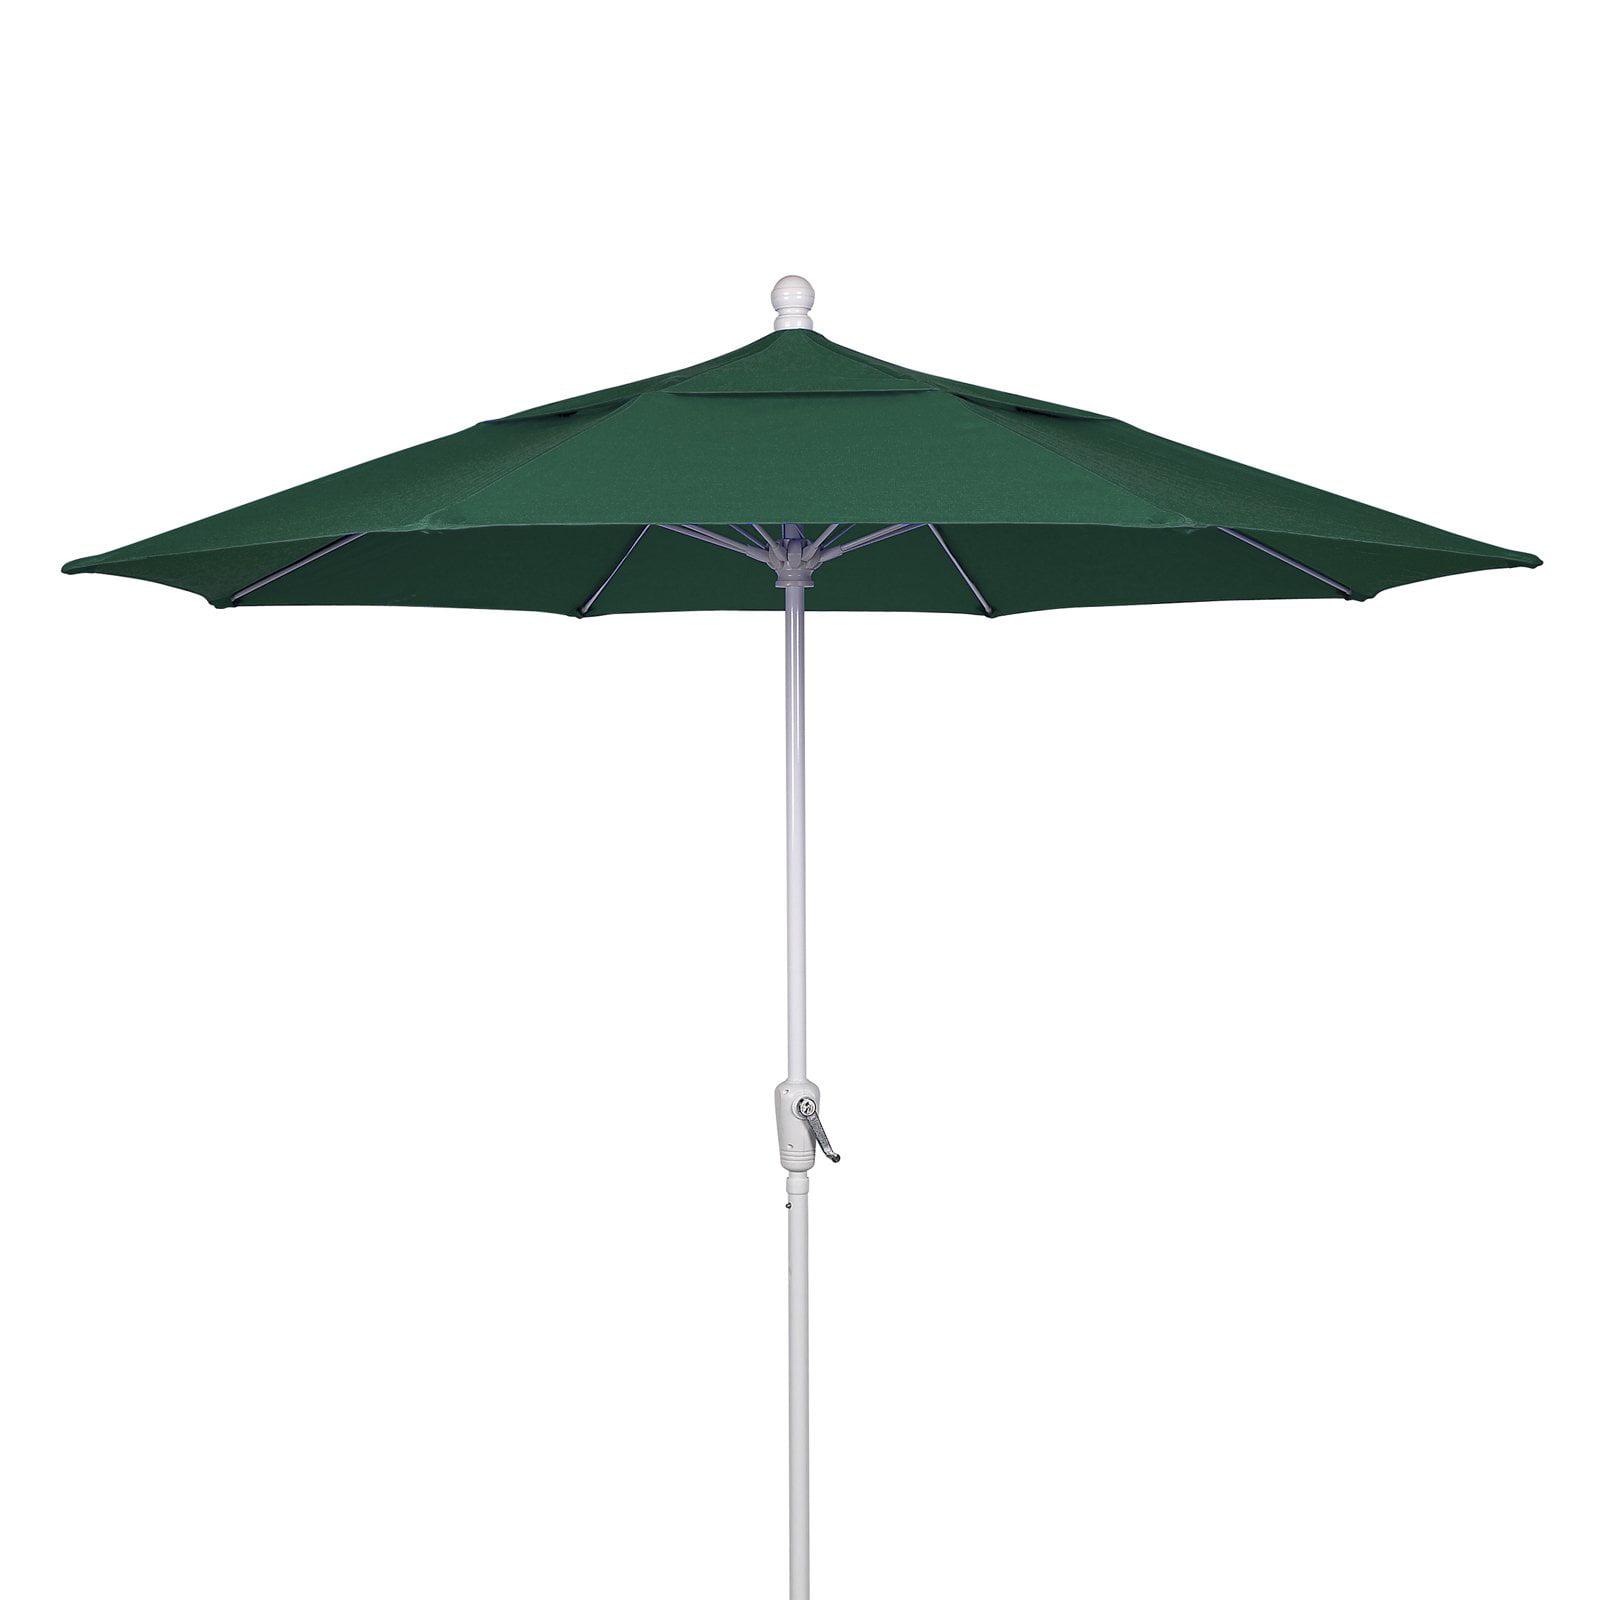 FiberBuilt 9 ft. Aluminum Wind Resistant Patio Umbrella